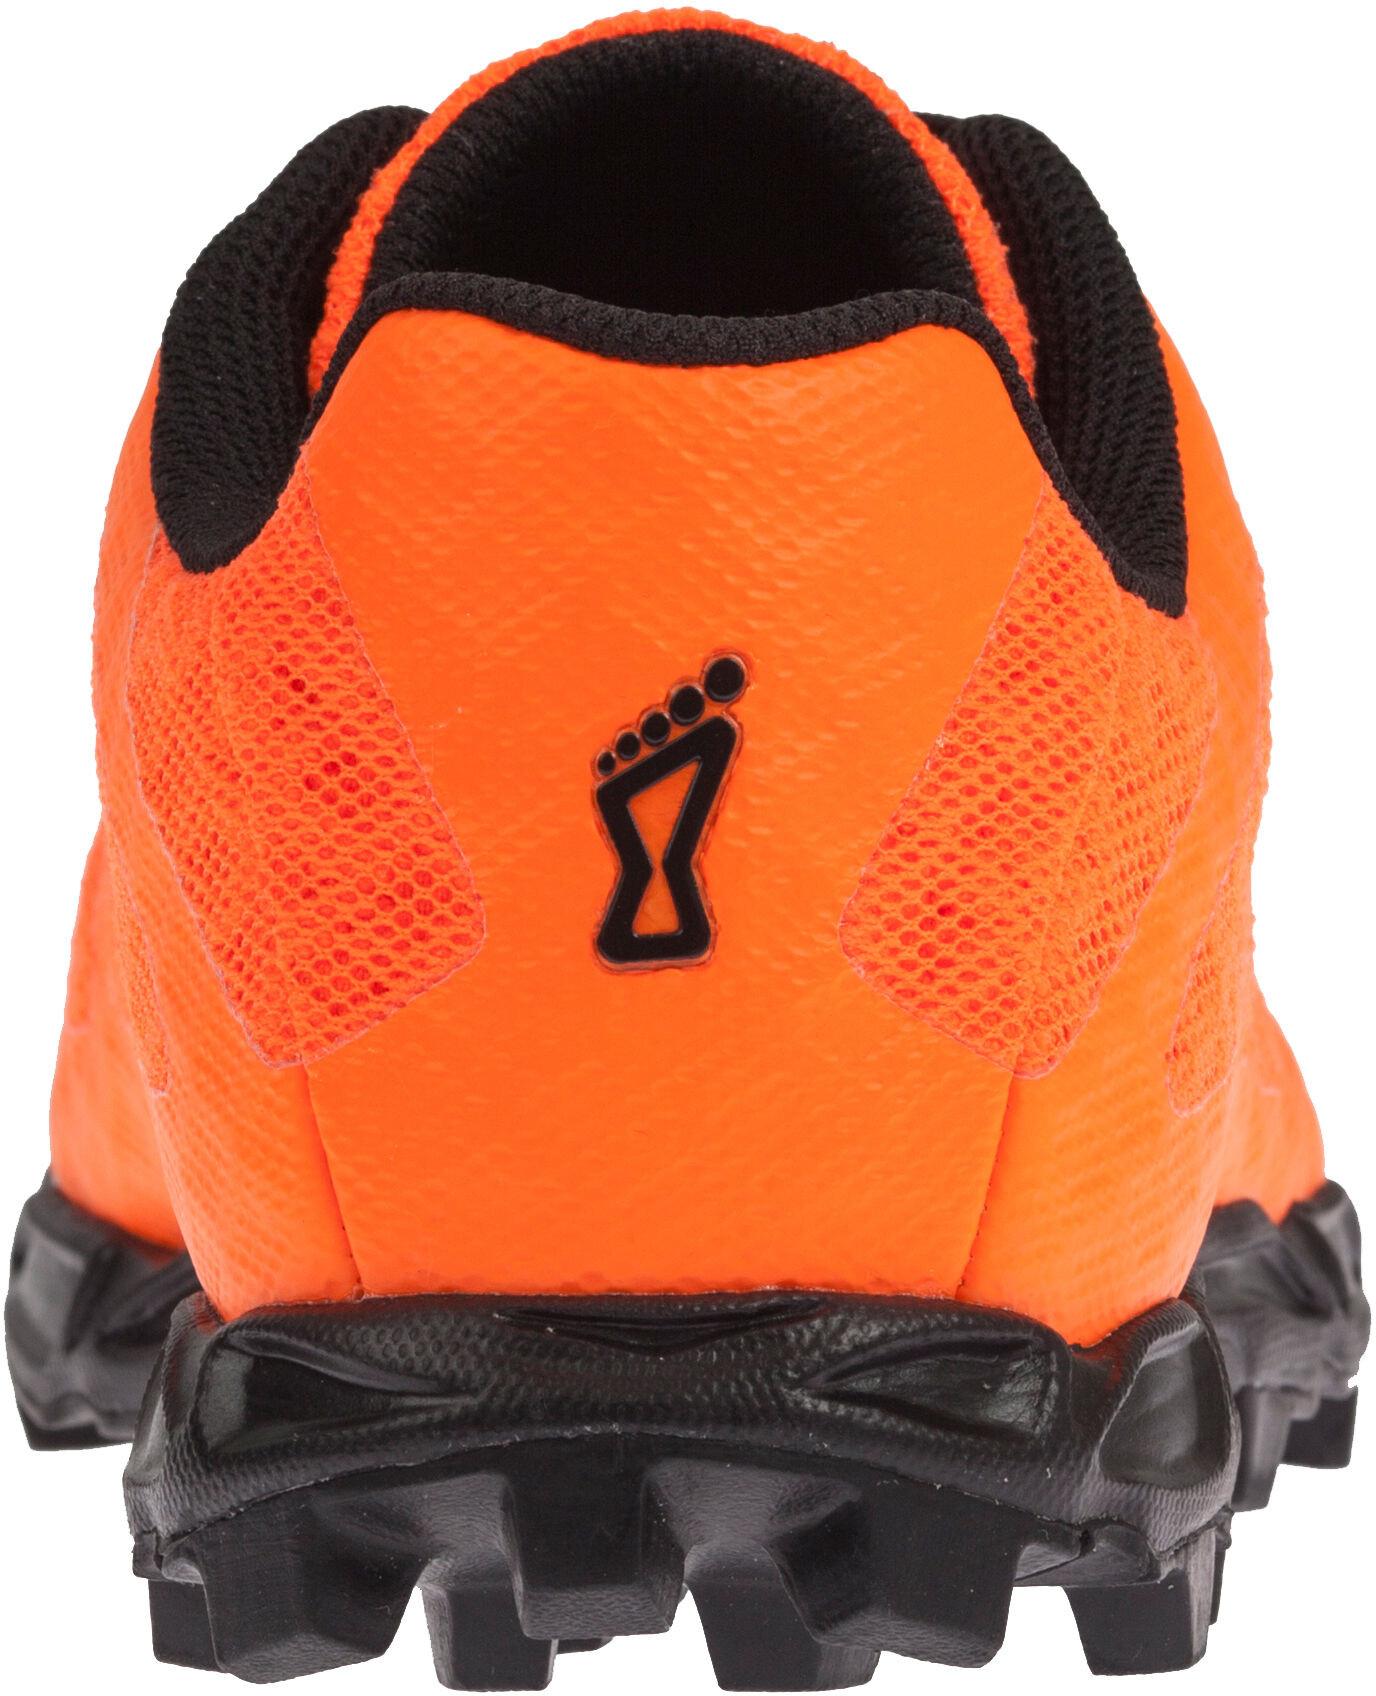 inov-8 X-Talon 210 Löparskor orange - till fenomenalt pris på Bikester e2d25f026ff0f